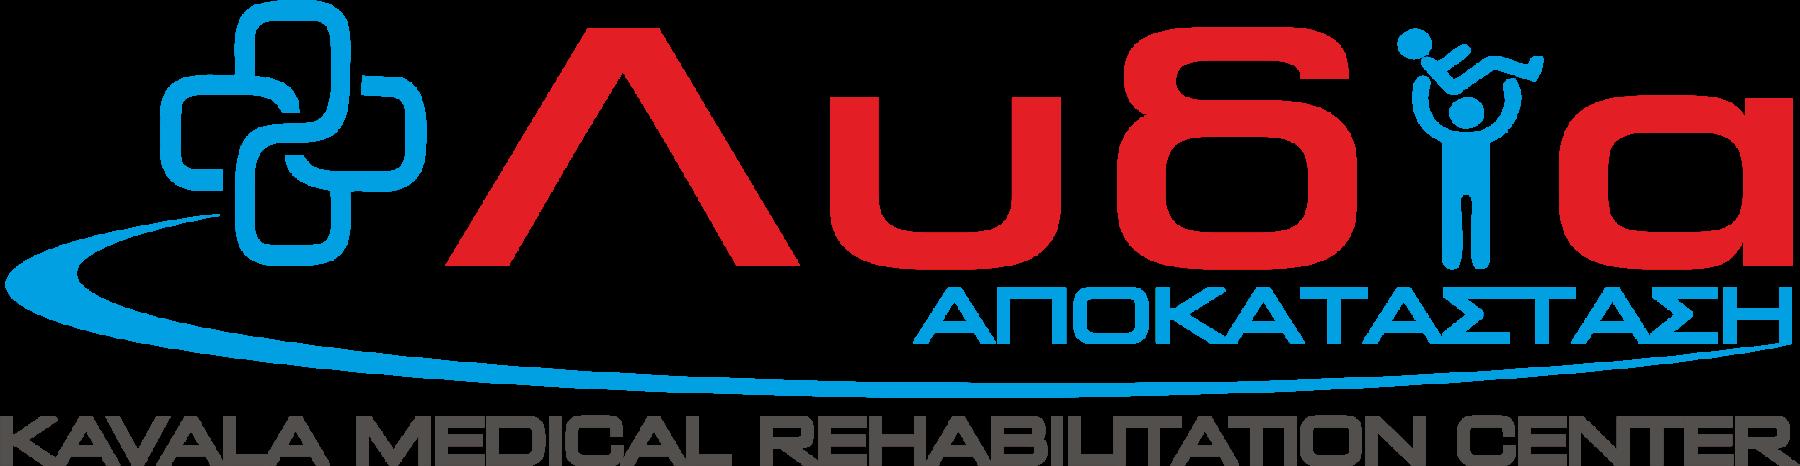 LYDIA Rehabilitation and Recovery Center